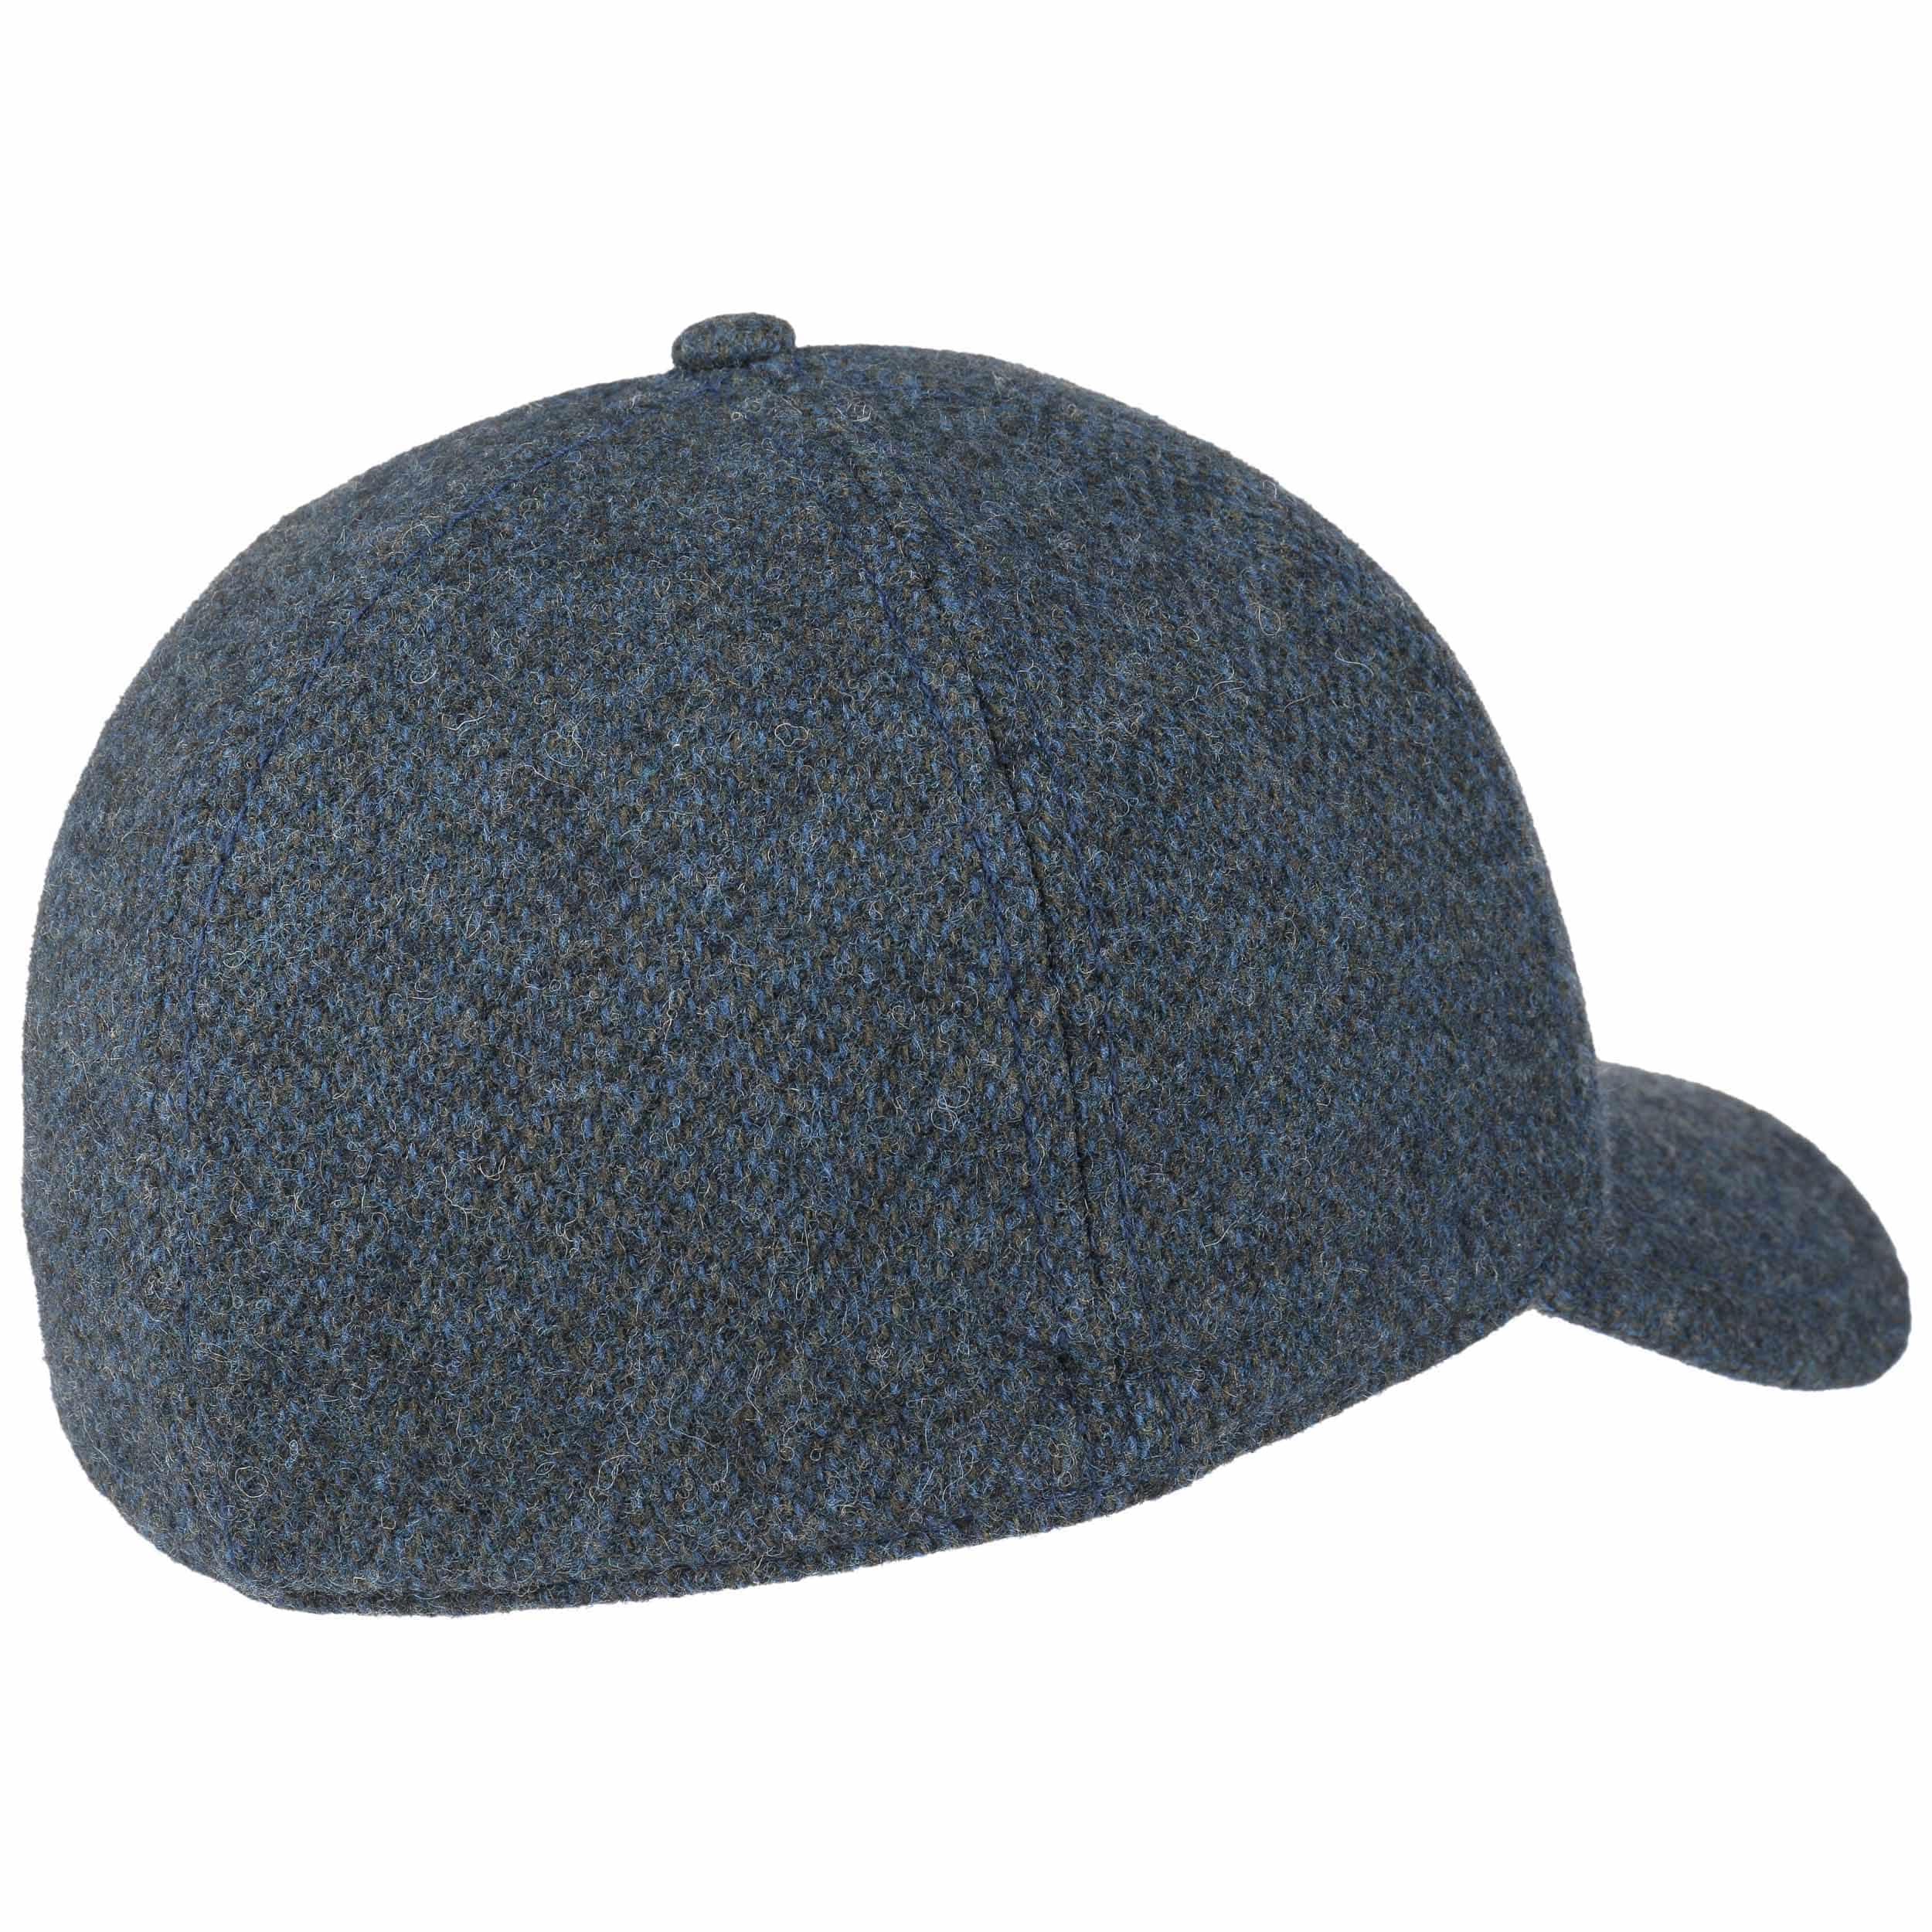 ... Plano Woolrich Cap by Stetson - blue 3 ... 1702701e64c9